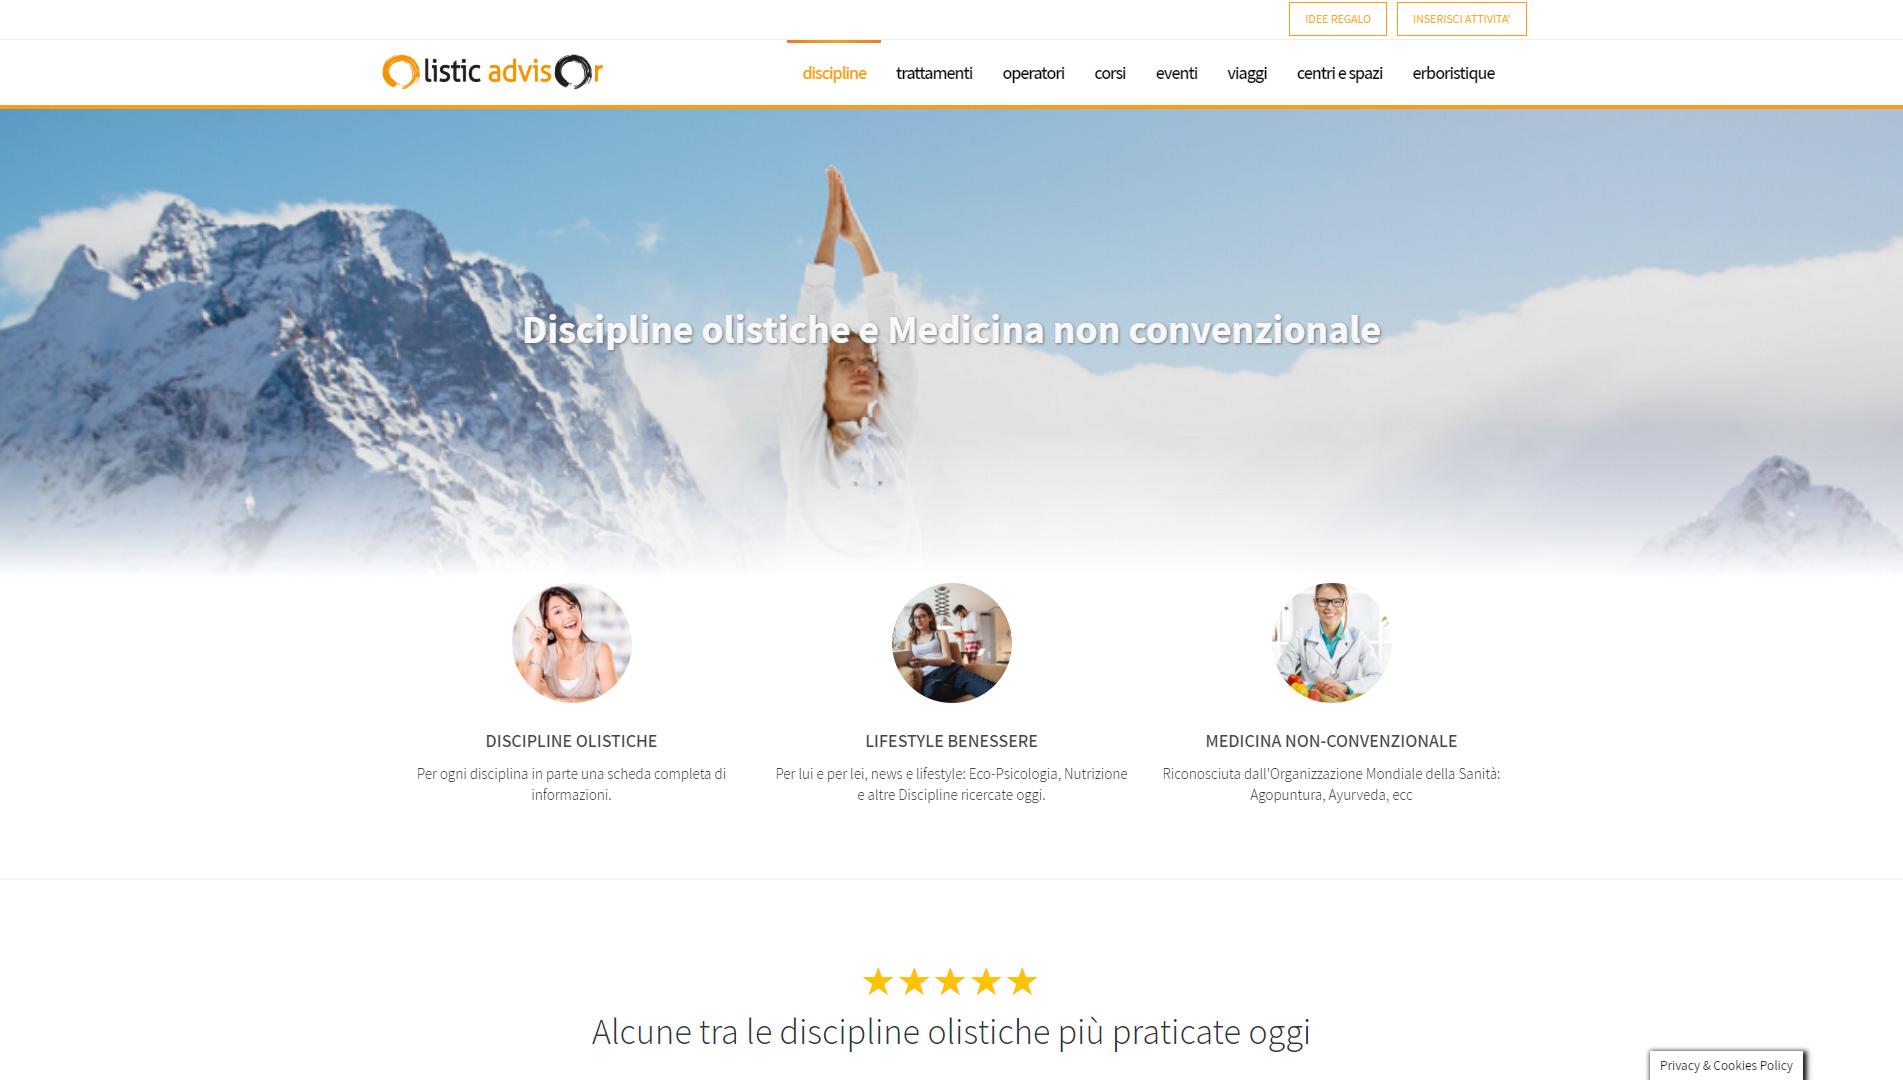 olisticadvisor